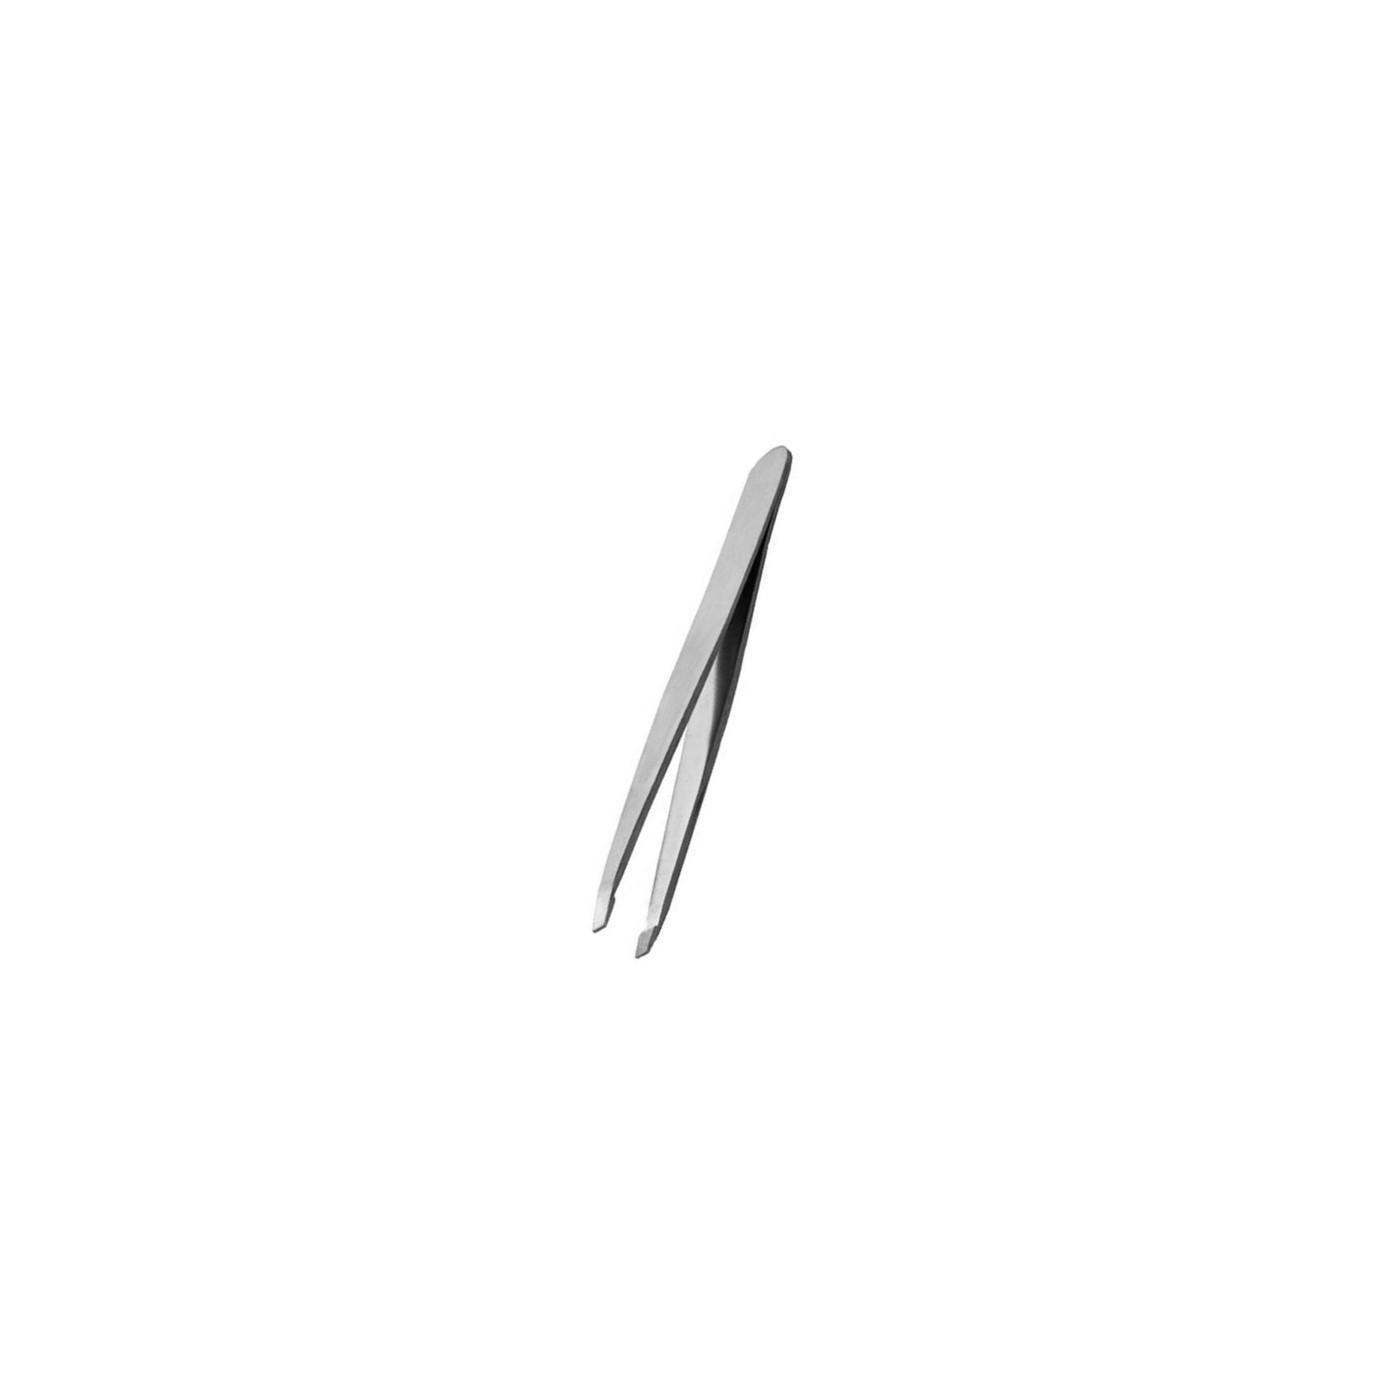 Tweezers from stainless steel (9 cm)